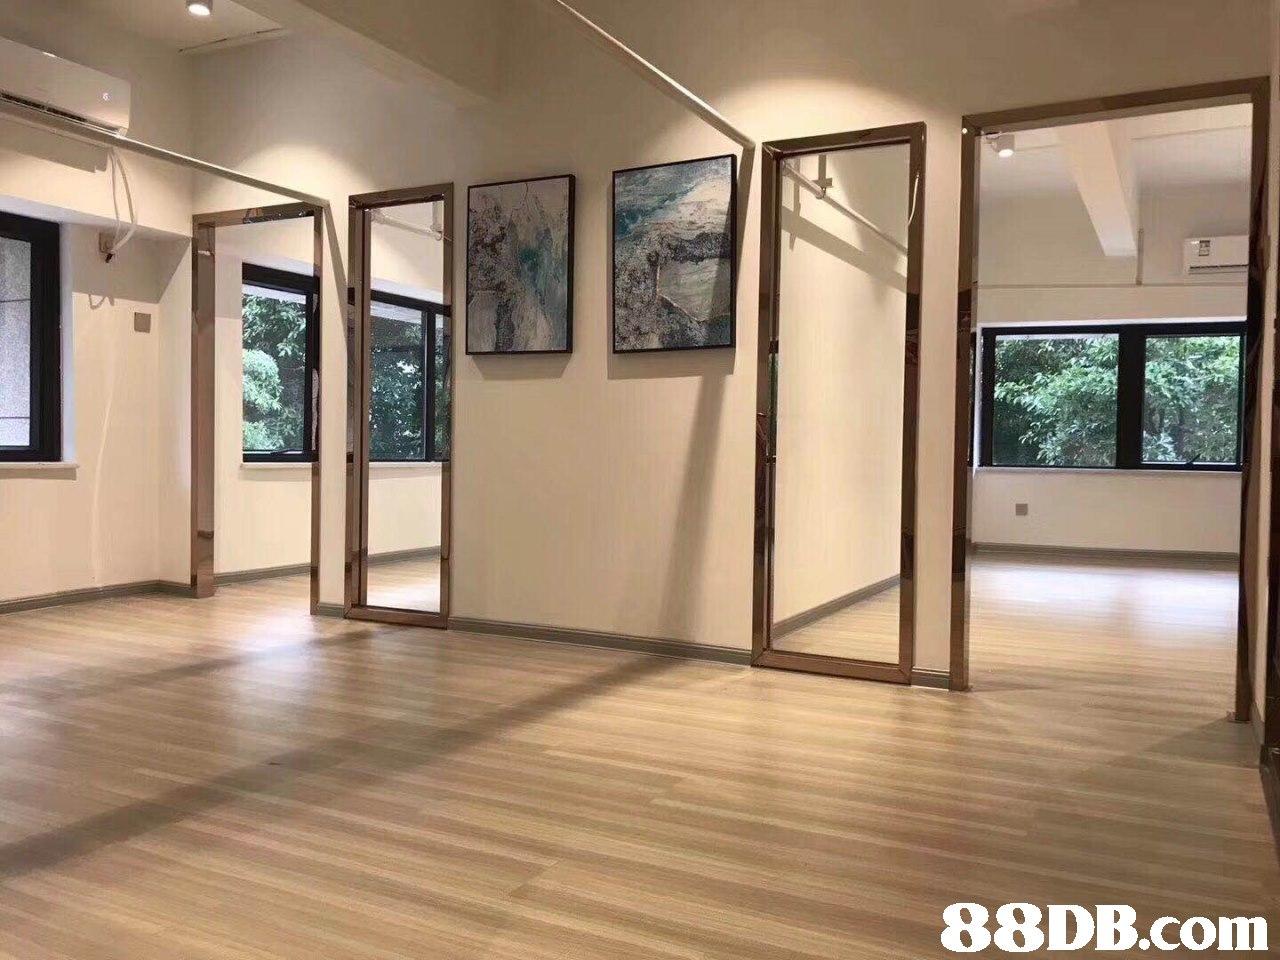 property,floor,flooring,laminate flooring,wood flooring